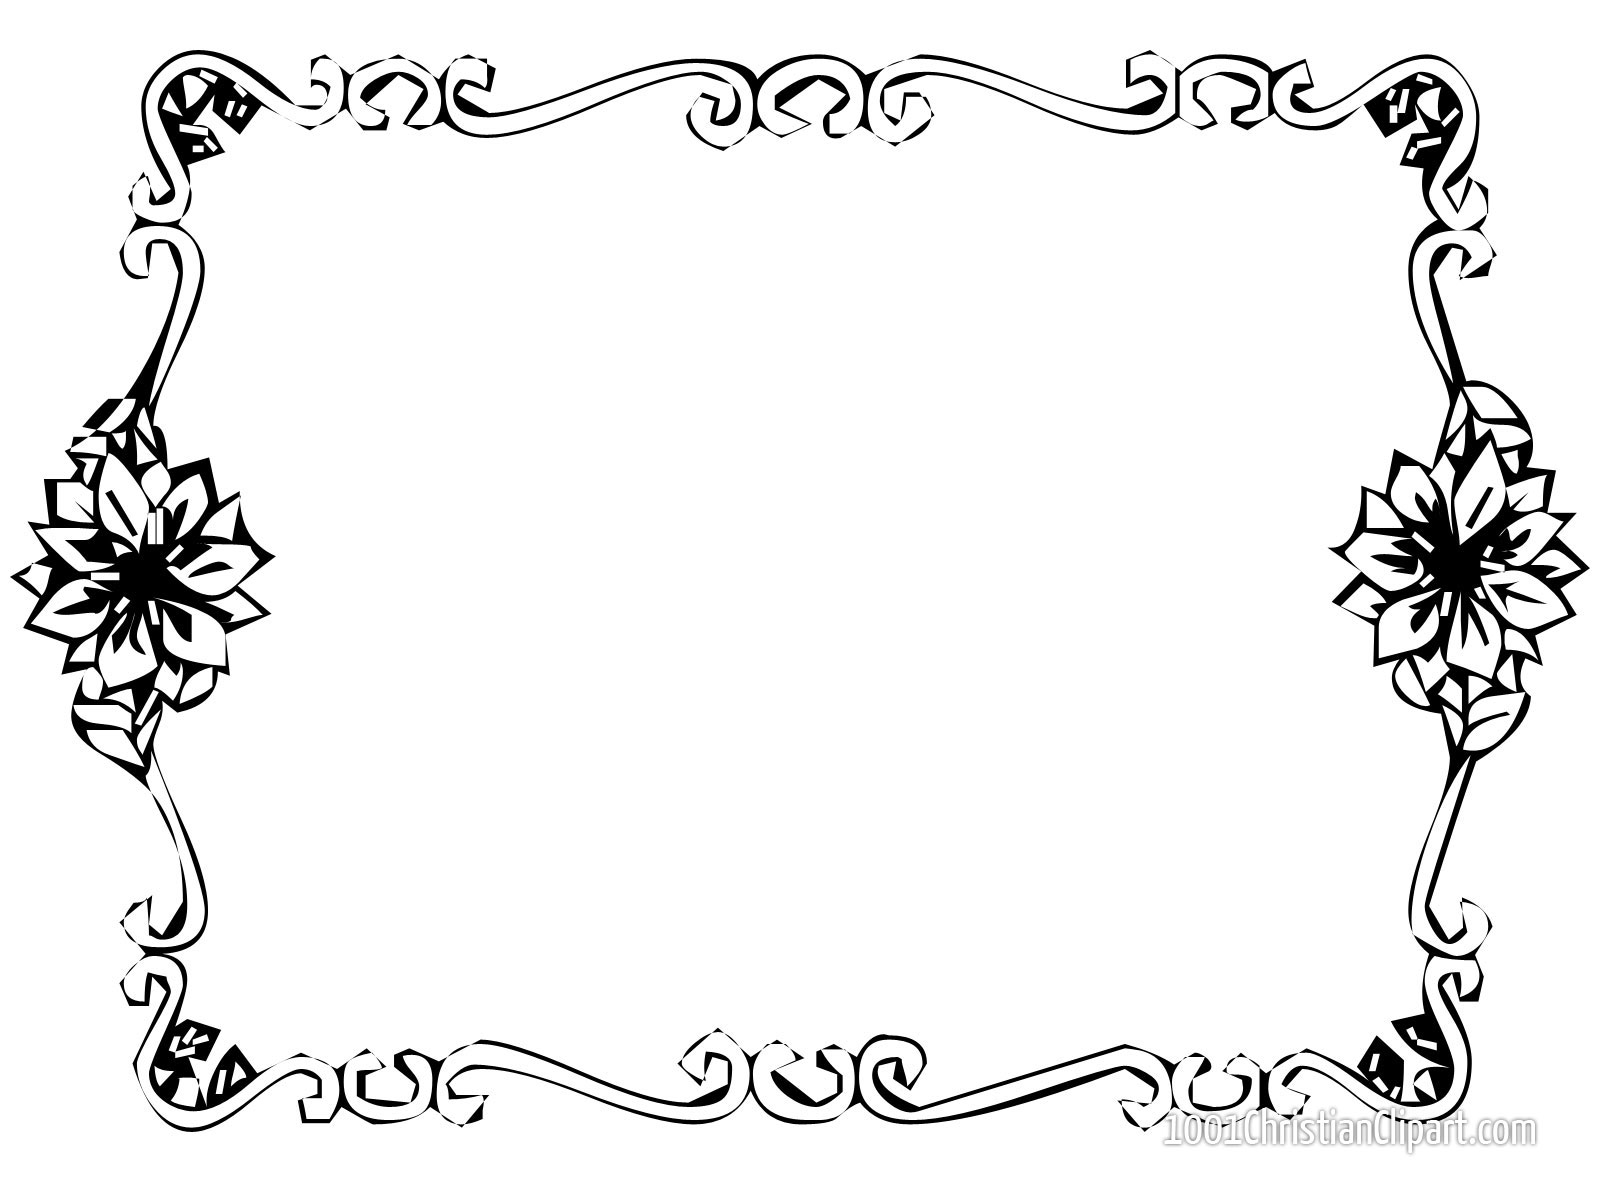 Free clip art border - ClipartFox-Free clip art border - ClipartFox-7